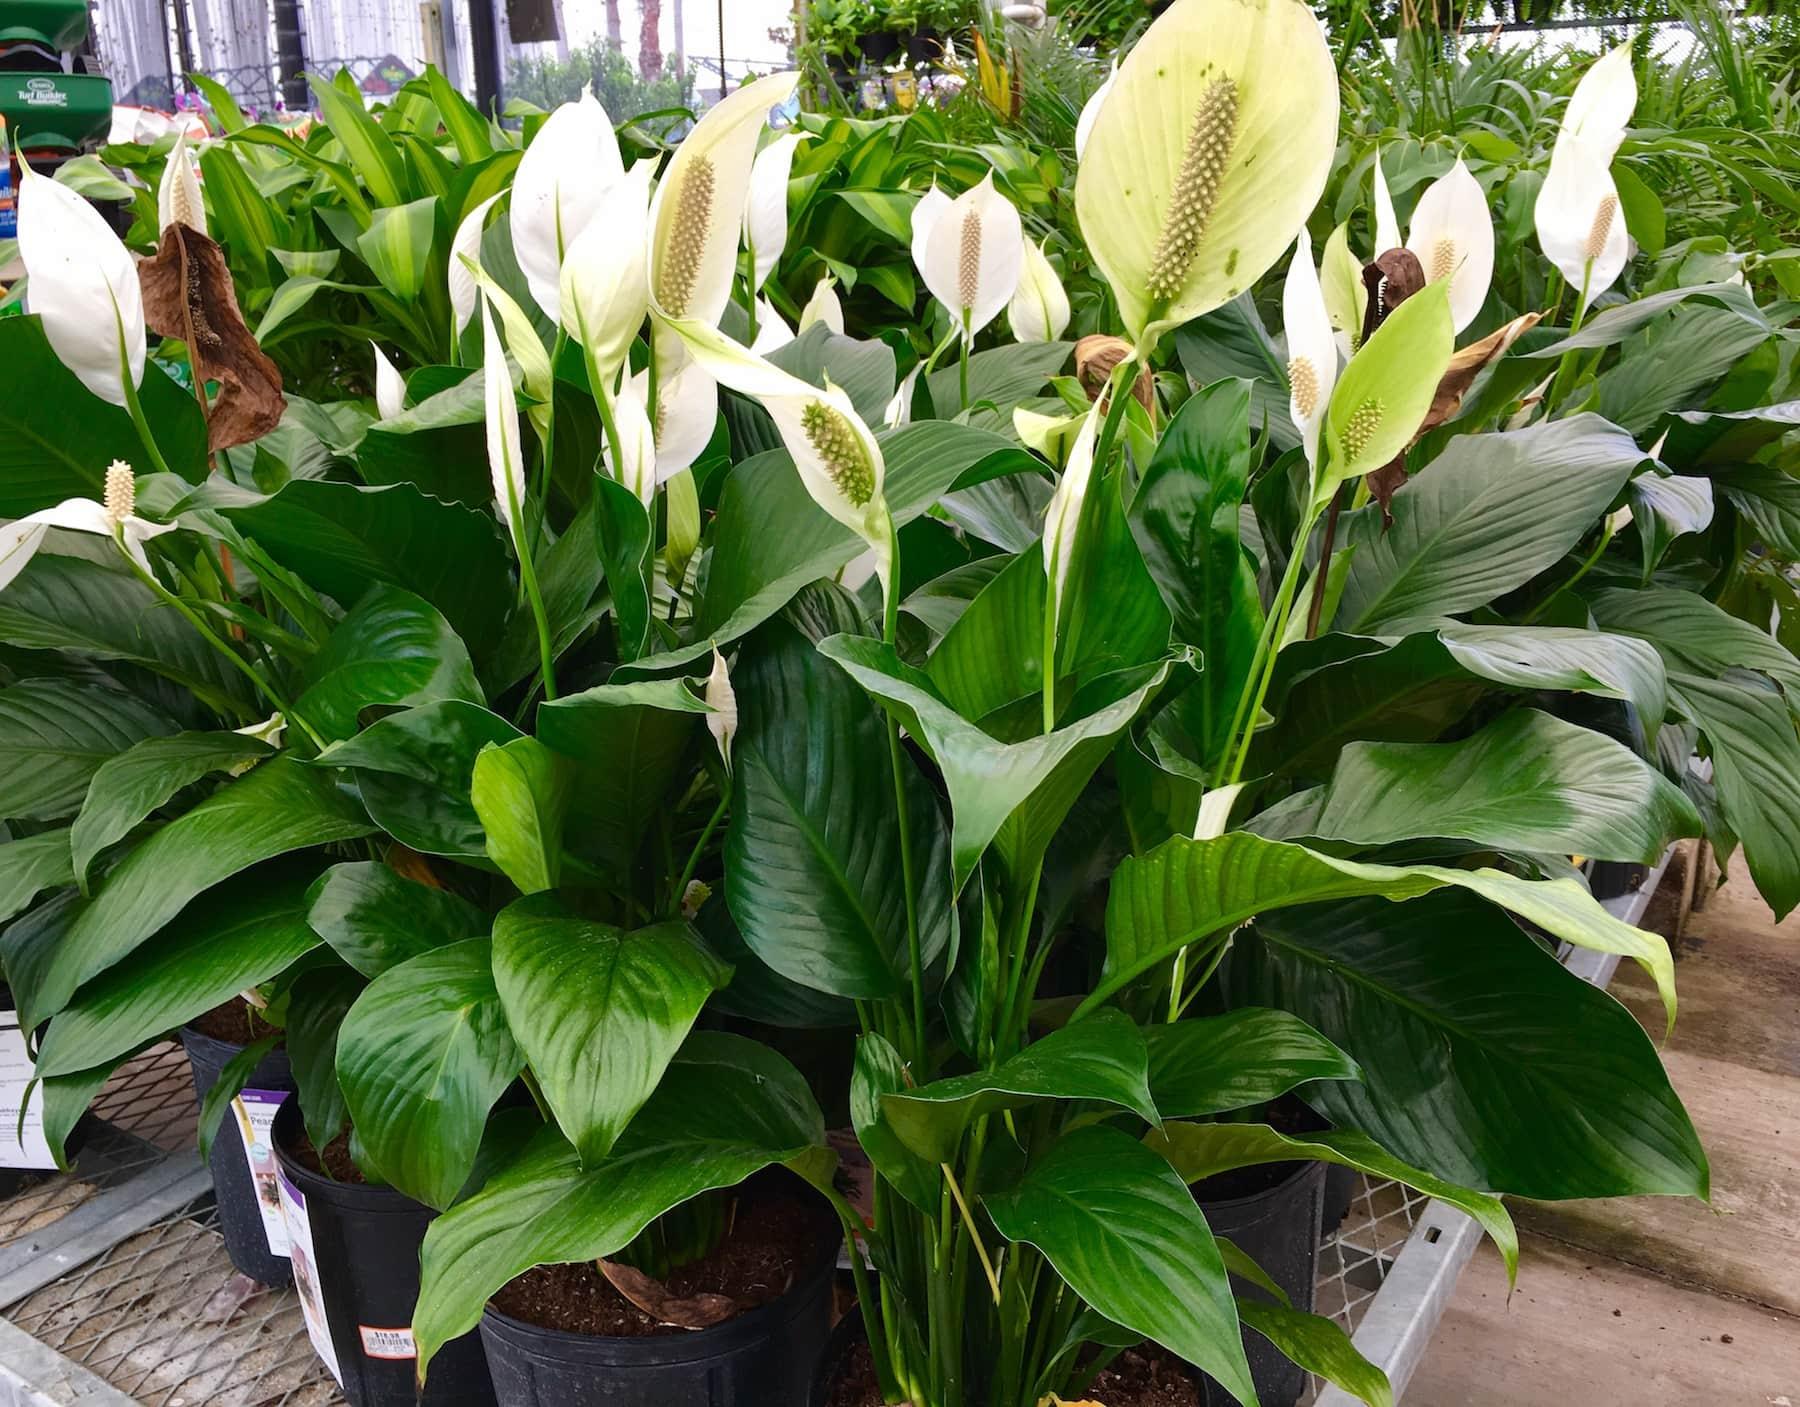 Best Bedroom Plants for Better Sleep - Get Green Be Well